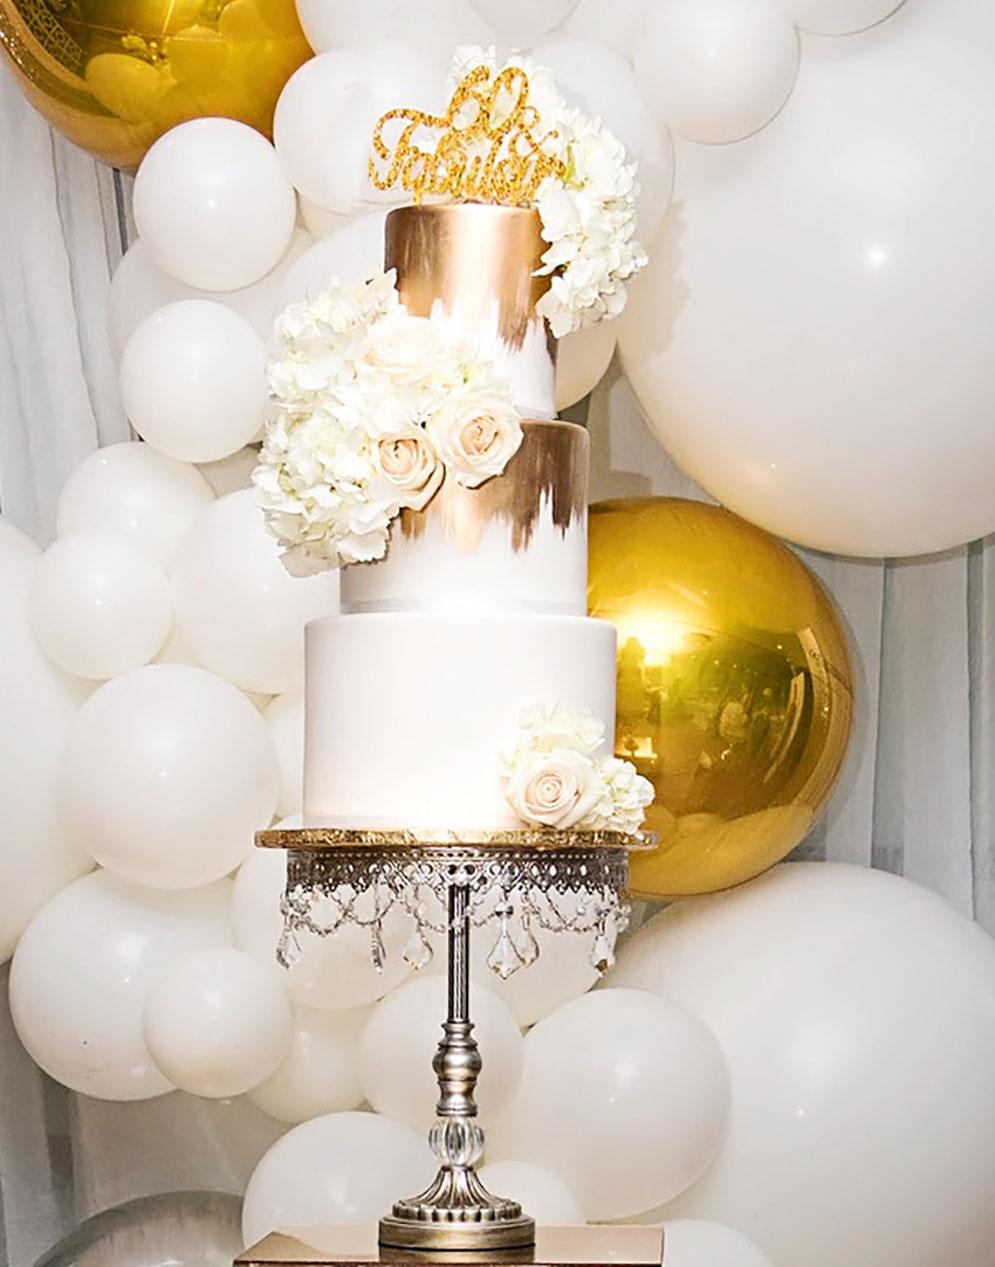 silver chandelier ball base cake stand.jpg